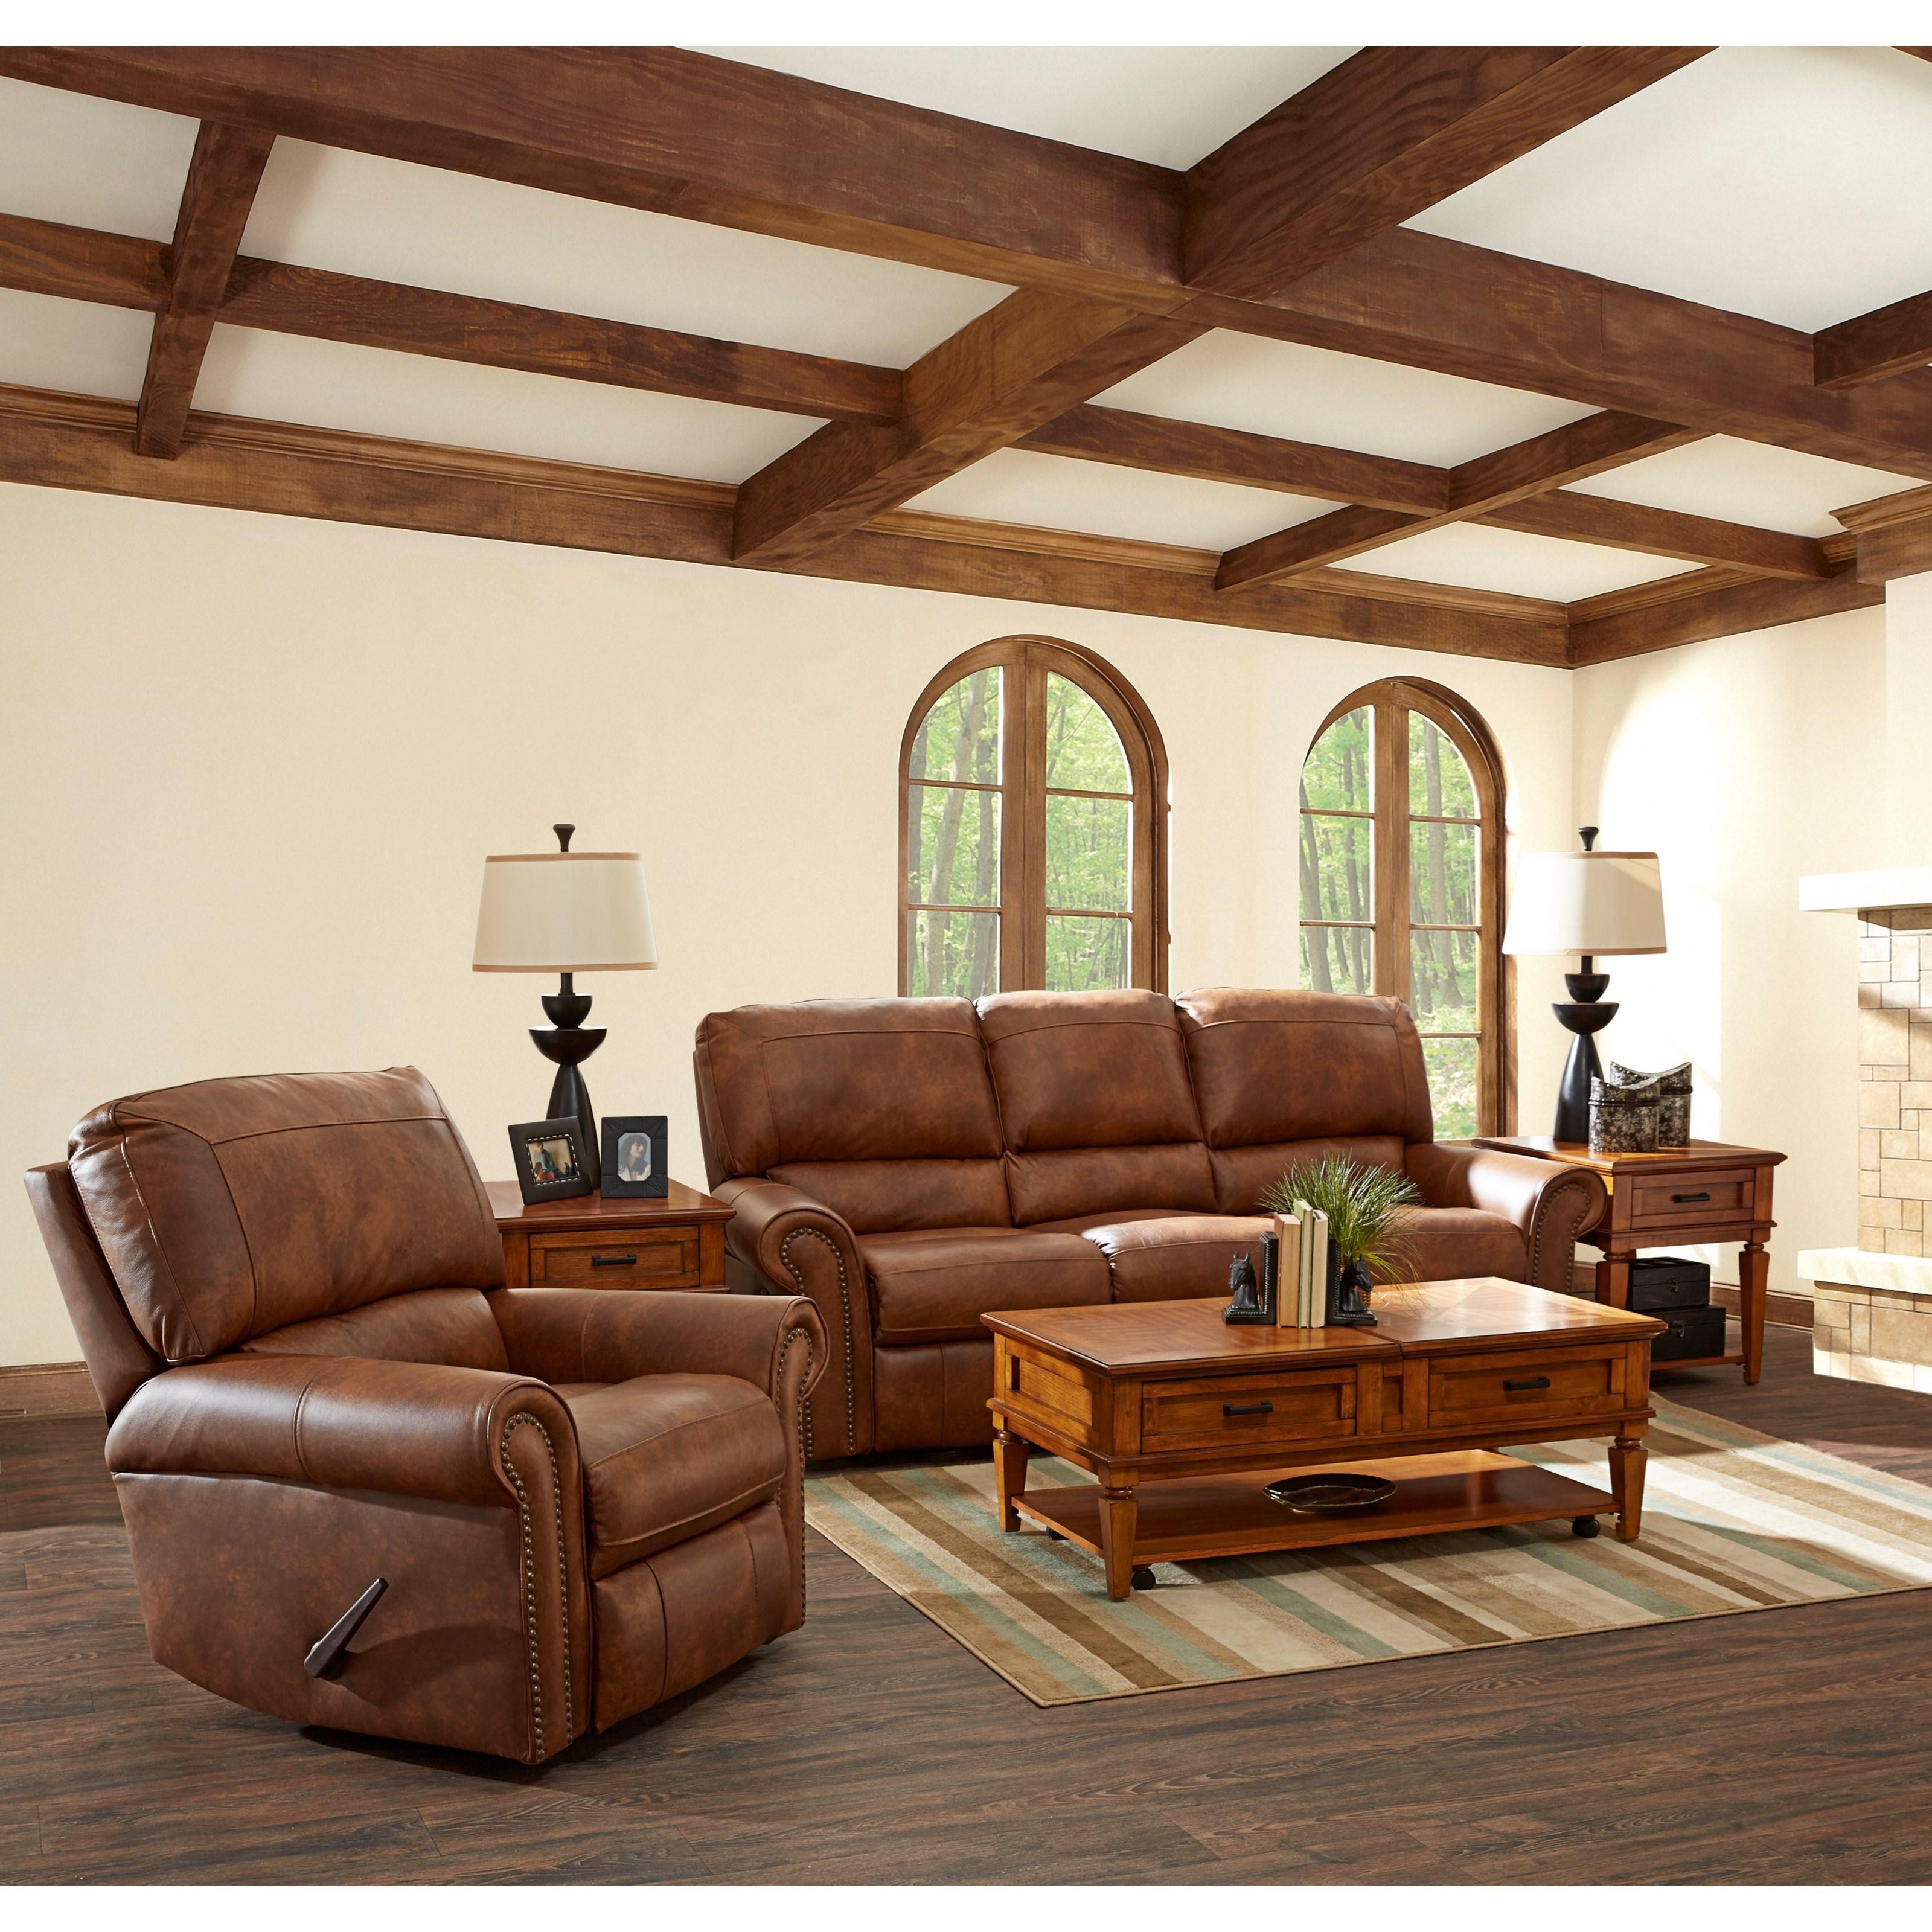 Klaussner Savannah Reclining Living Room Group Hudson 39 S Furniture Reclining Living Room Groups